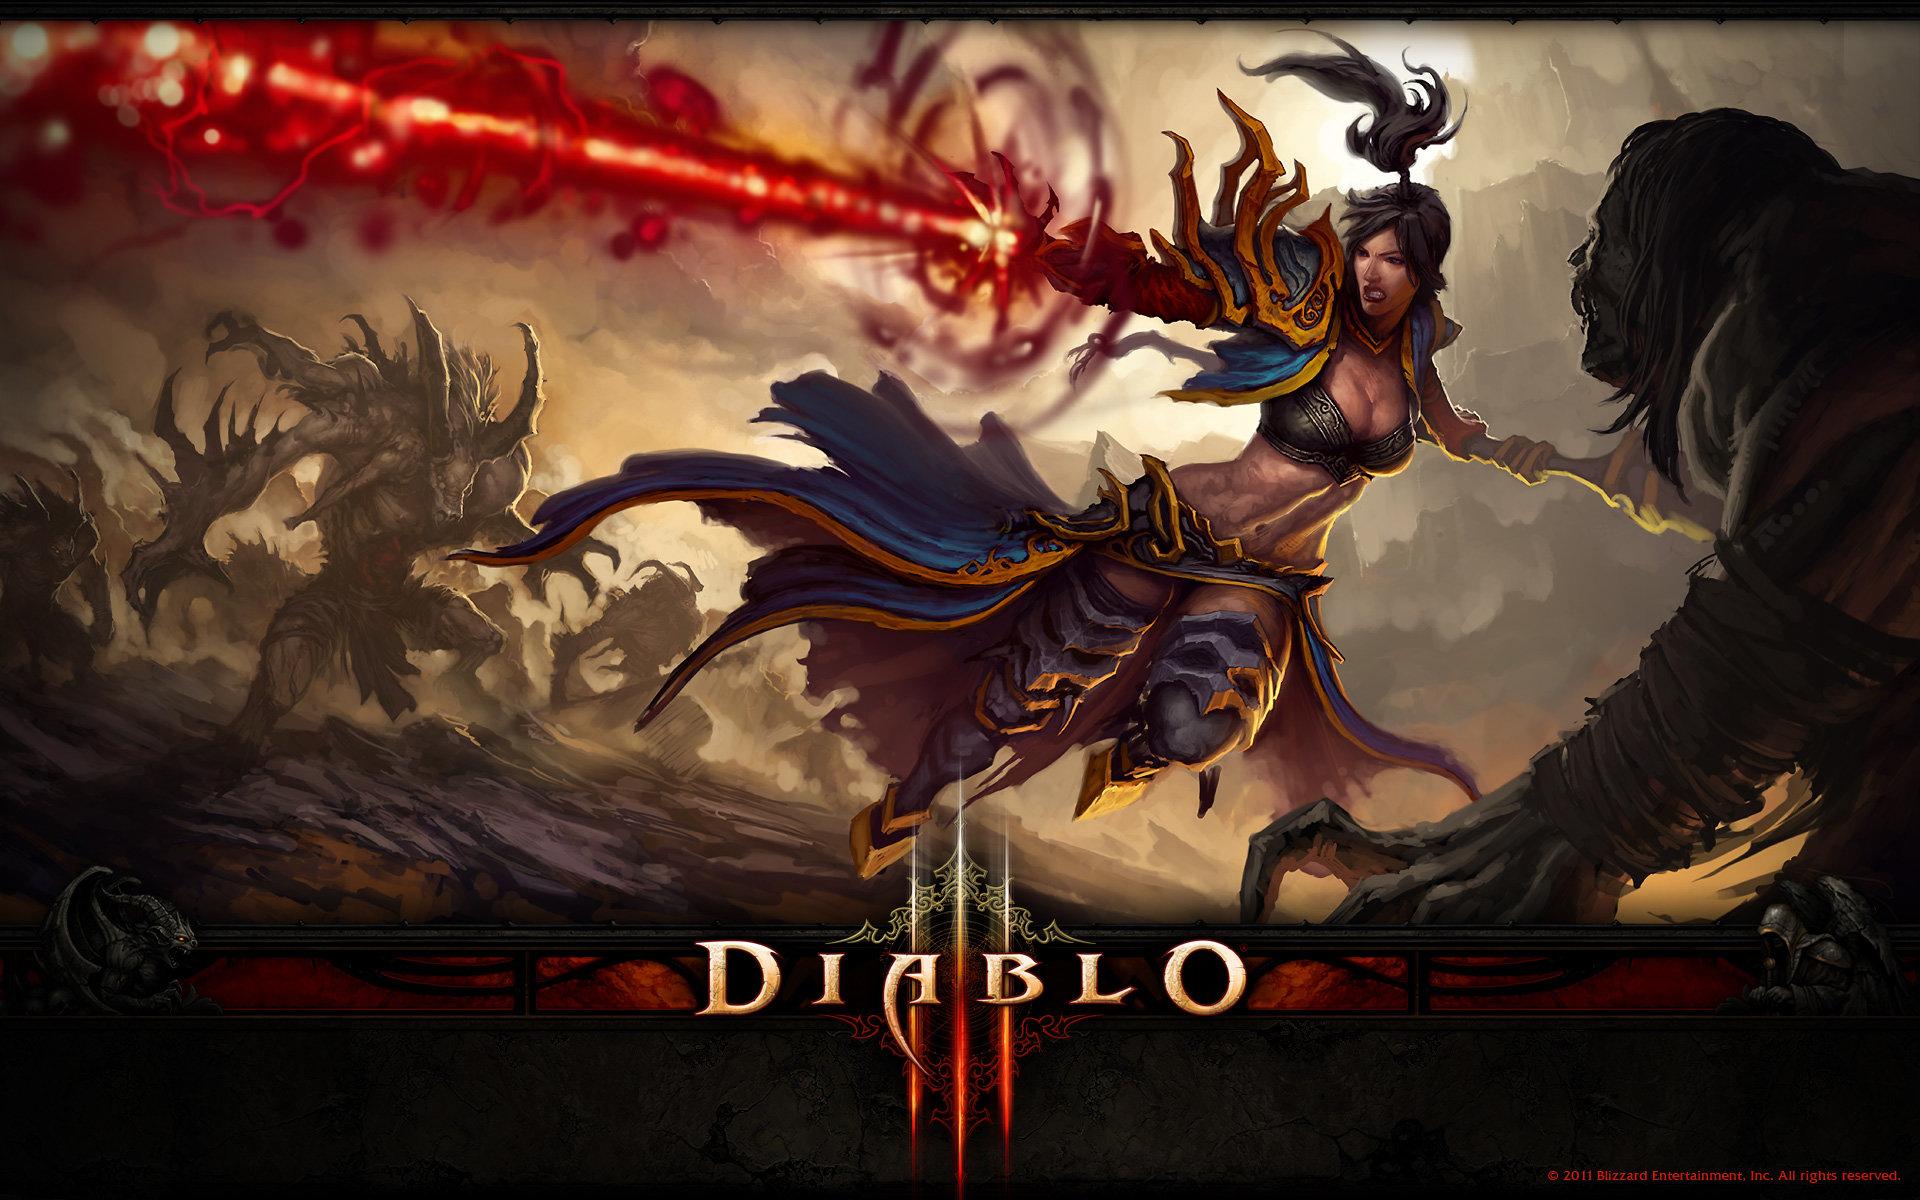 Diablo 3 wallpaper adult photos